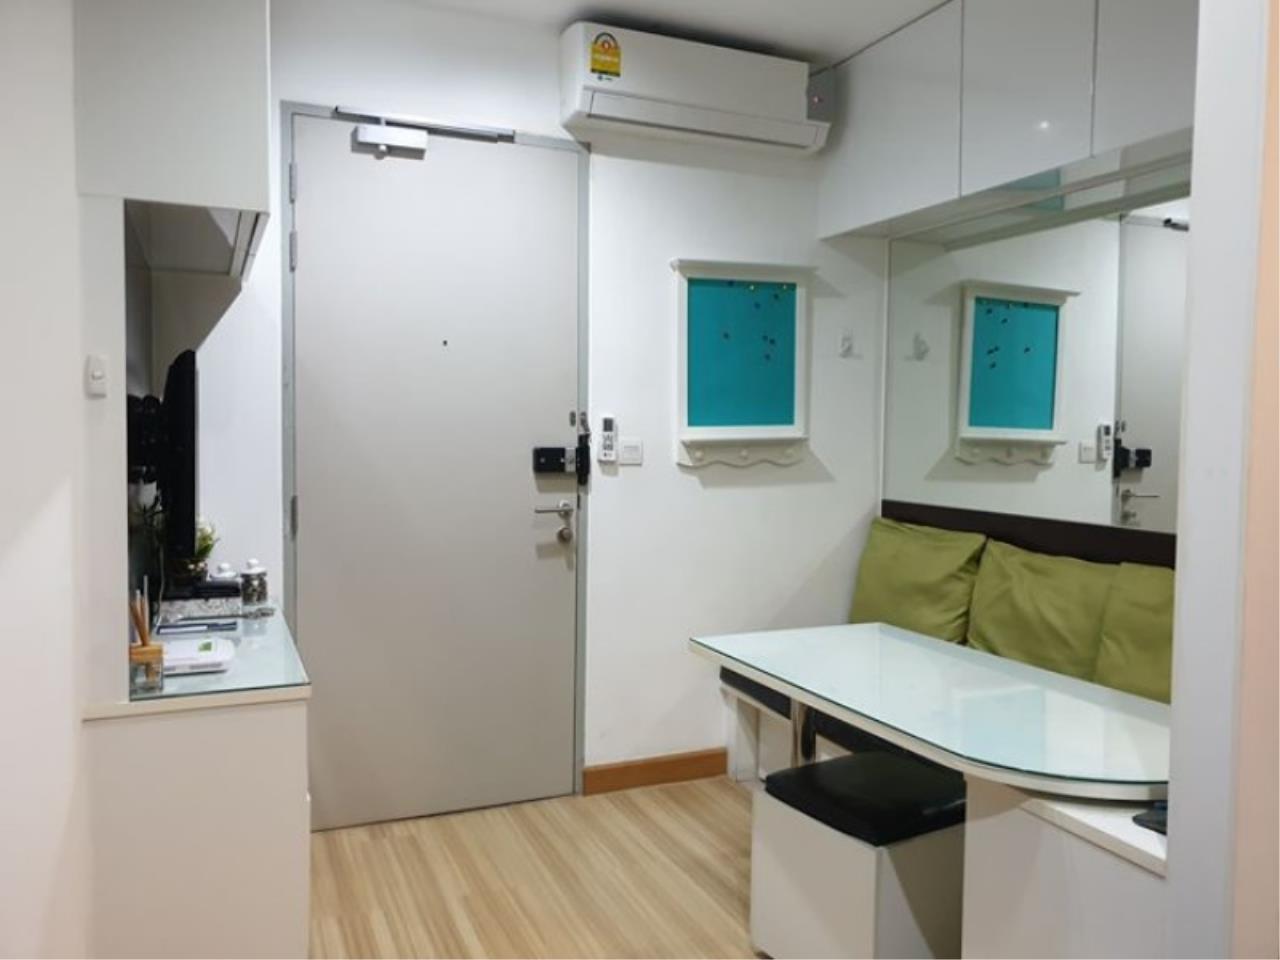 Century21 Skylux Agency's Ideo Mobi Phayathai / Condo For Sale / 1 Bedroom / 22 SQM / BTS Phaya Thai / Bangkok 2